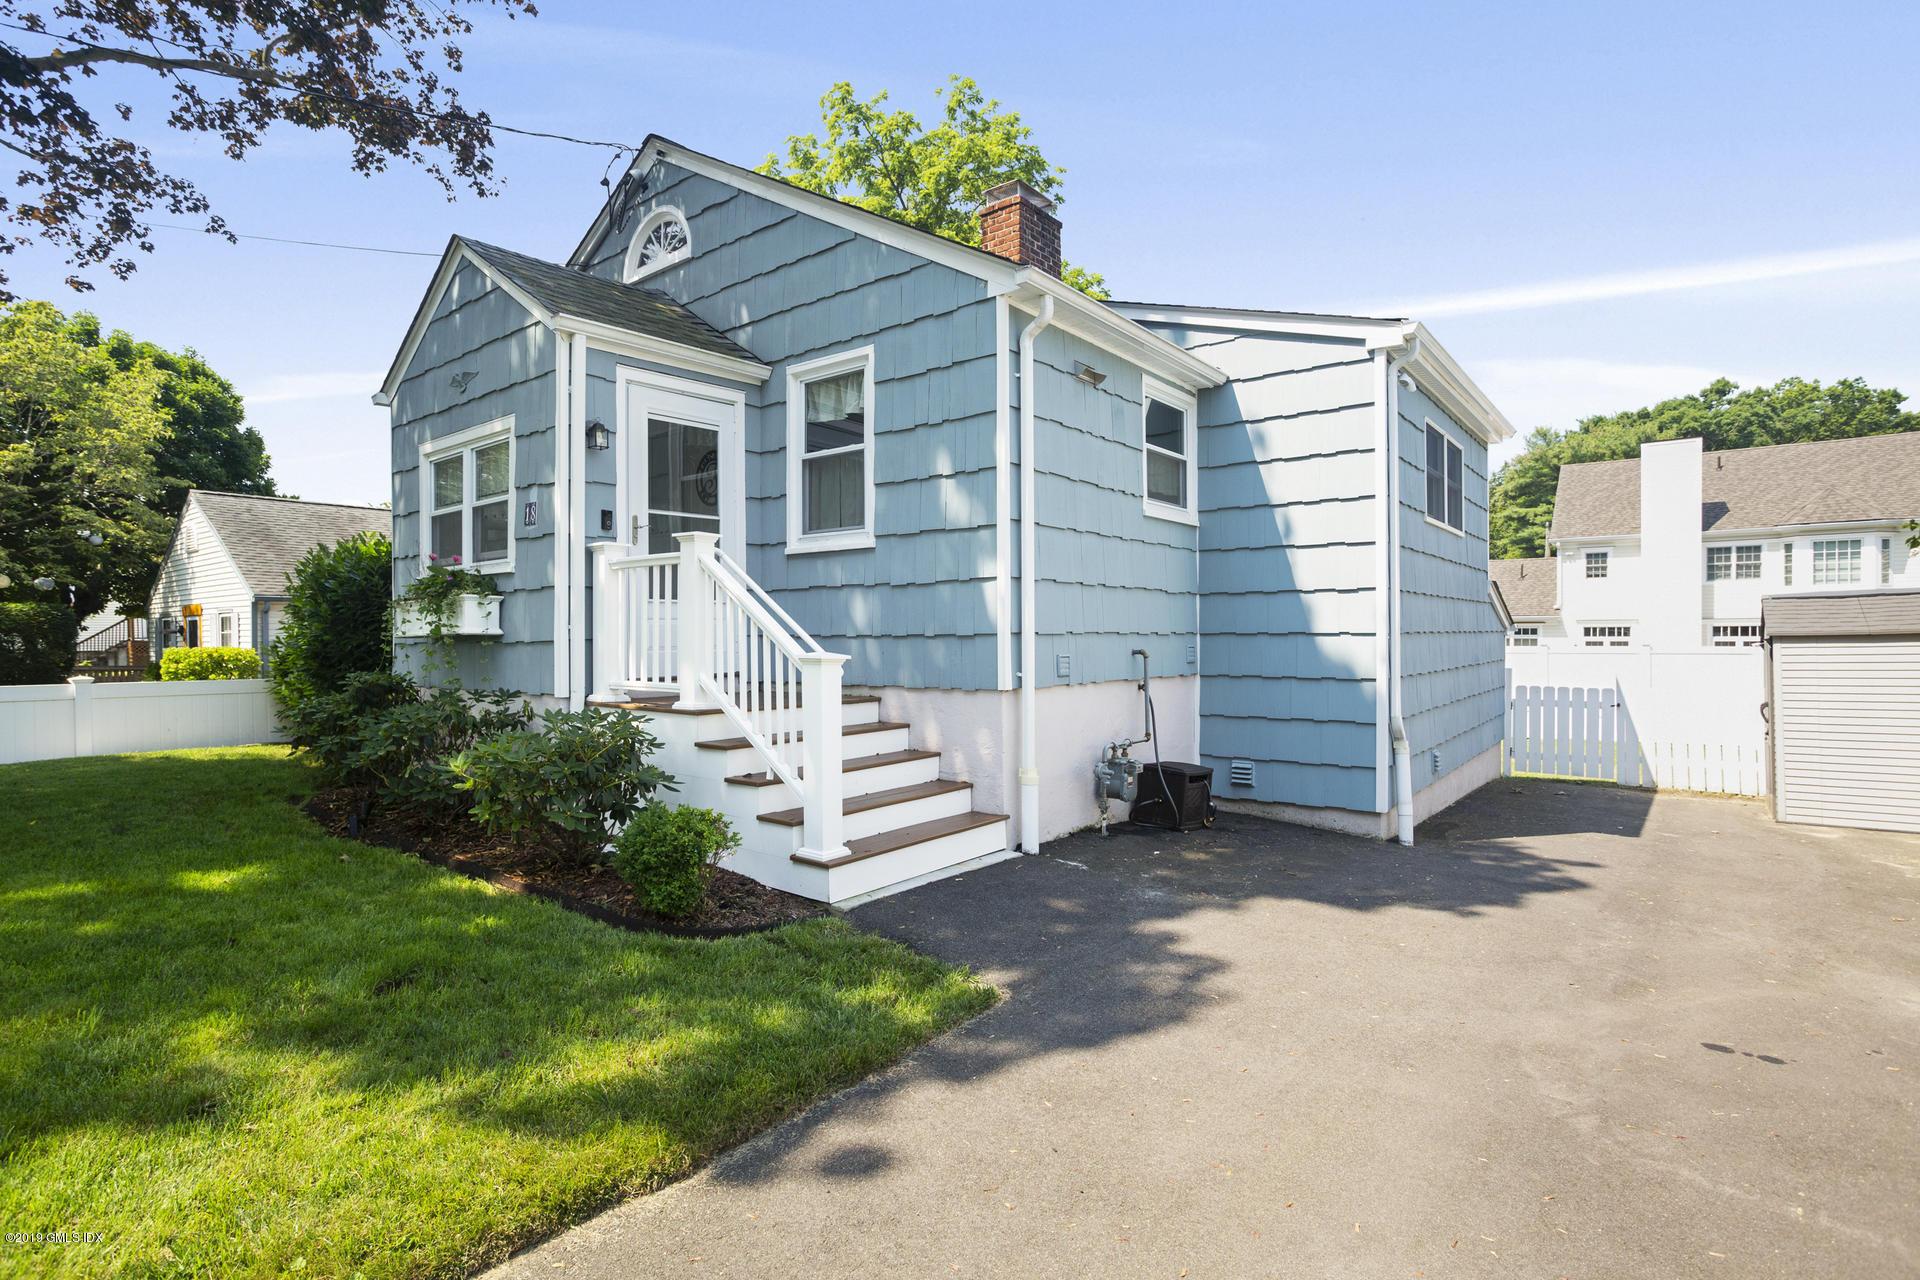 18 Spezzano Drive,Riverside,Connecticut 06878,3 Bedrooms Bedrooms,2 BathroomsBathrooms,Single family,Spezzano,107538